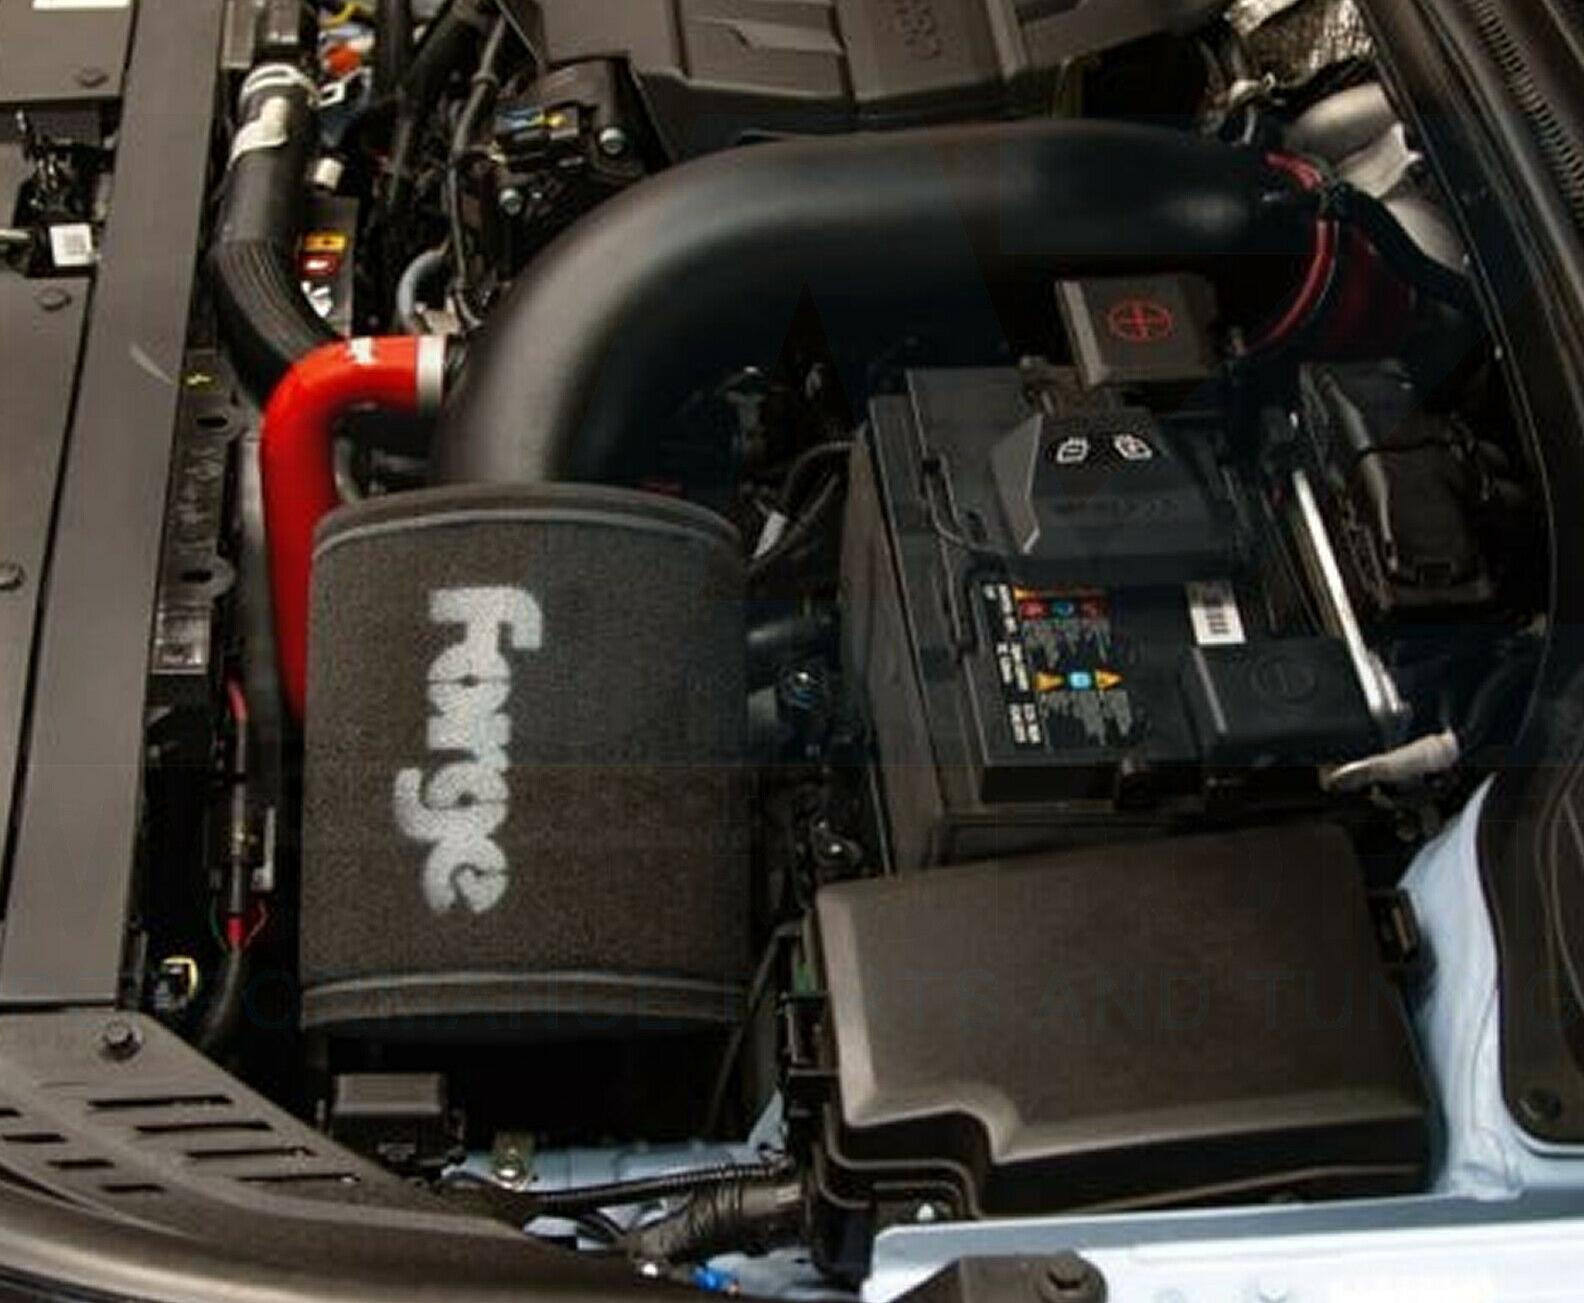 Комплект спортивного воздушного фильтра FORGE для Hyundai i30N 2019 - bob drury valley forge